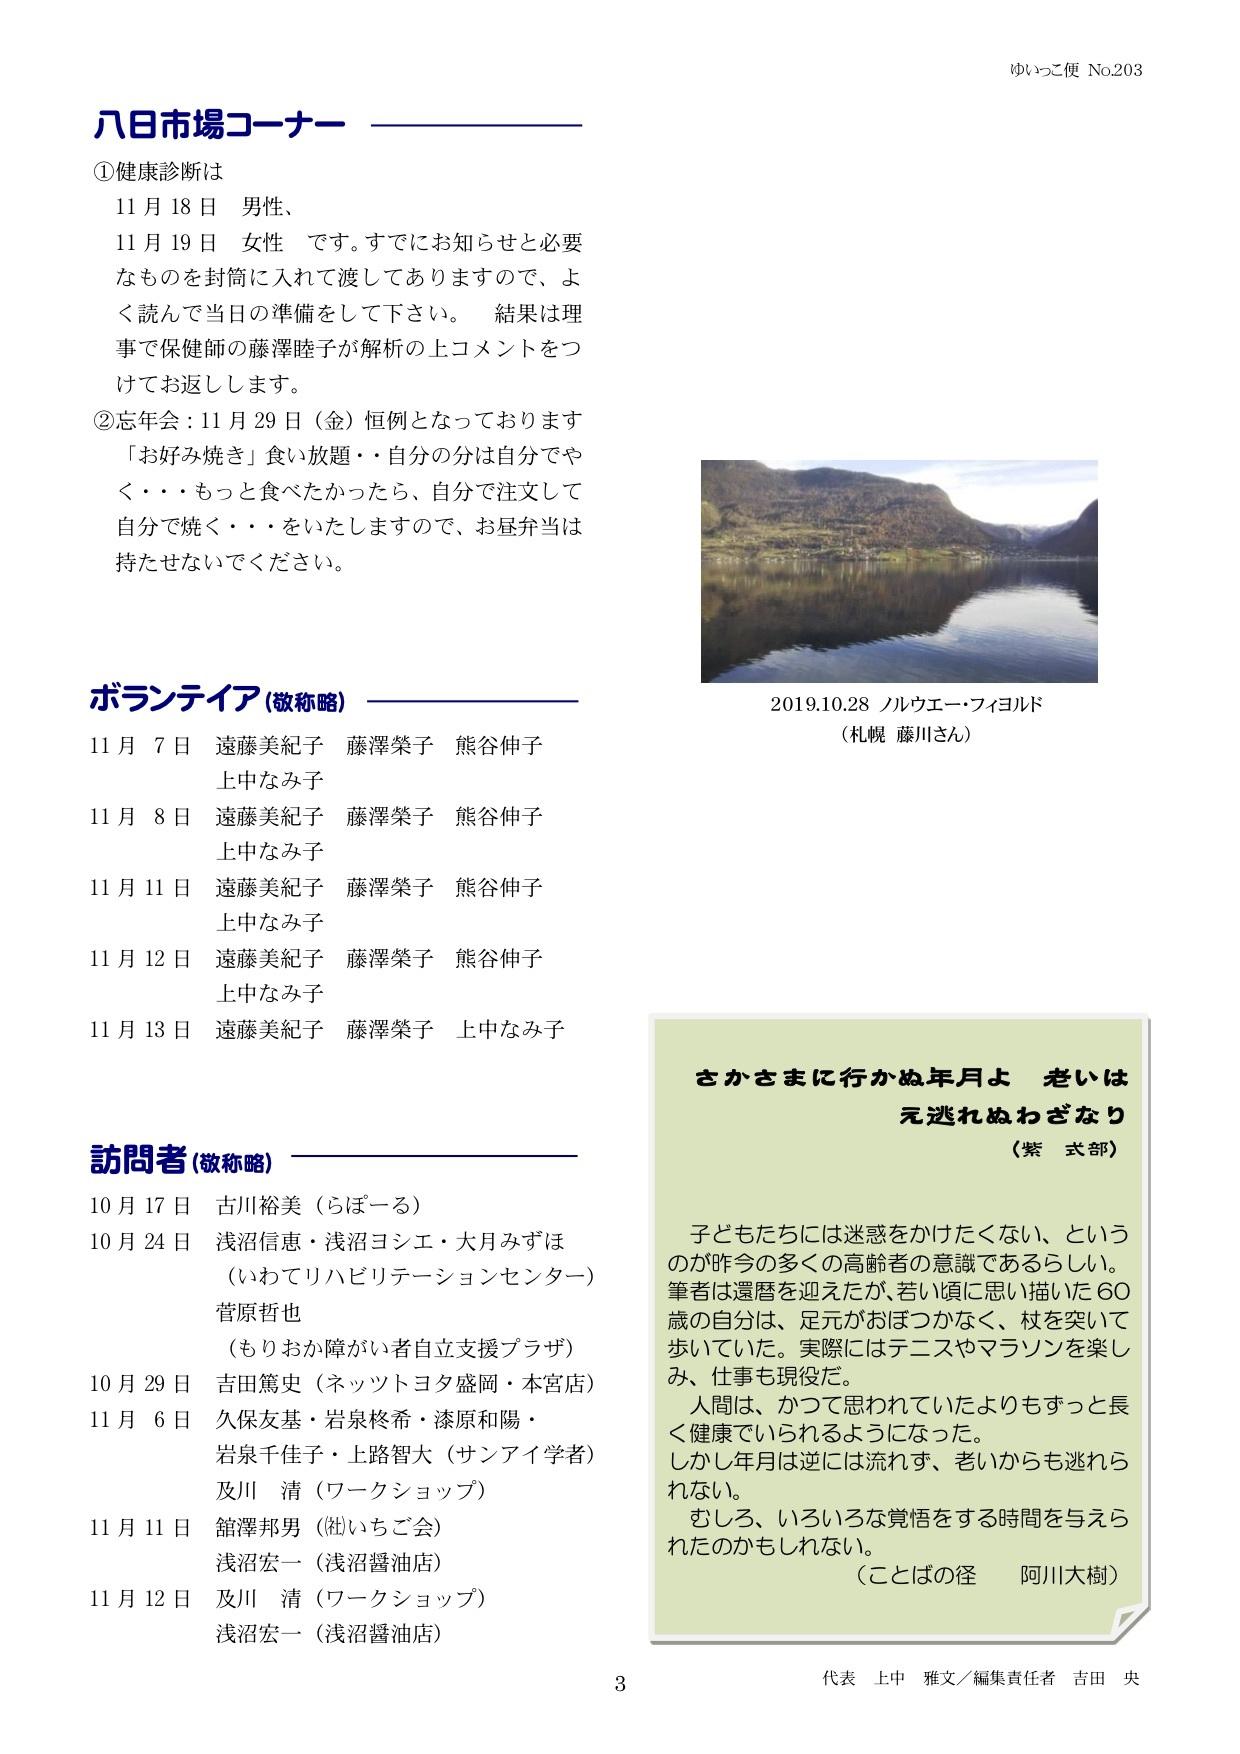 「You-Meゆいっこ便」No.203(2019.11.15)_a0103650_21070505.jpg